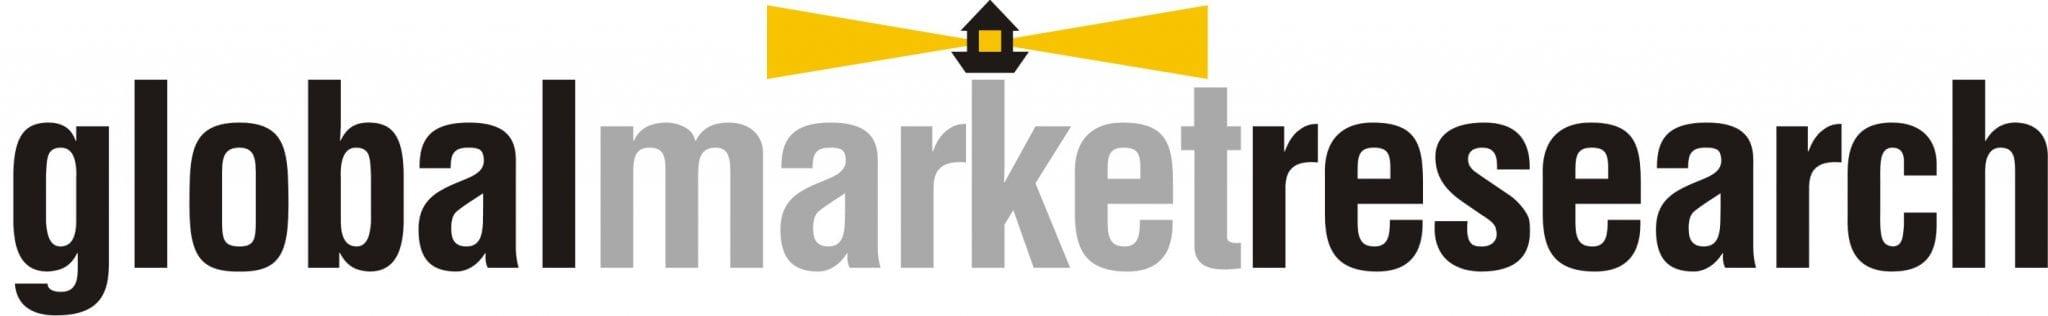 Global Market research_Logo